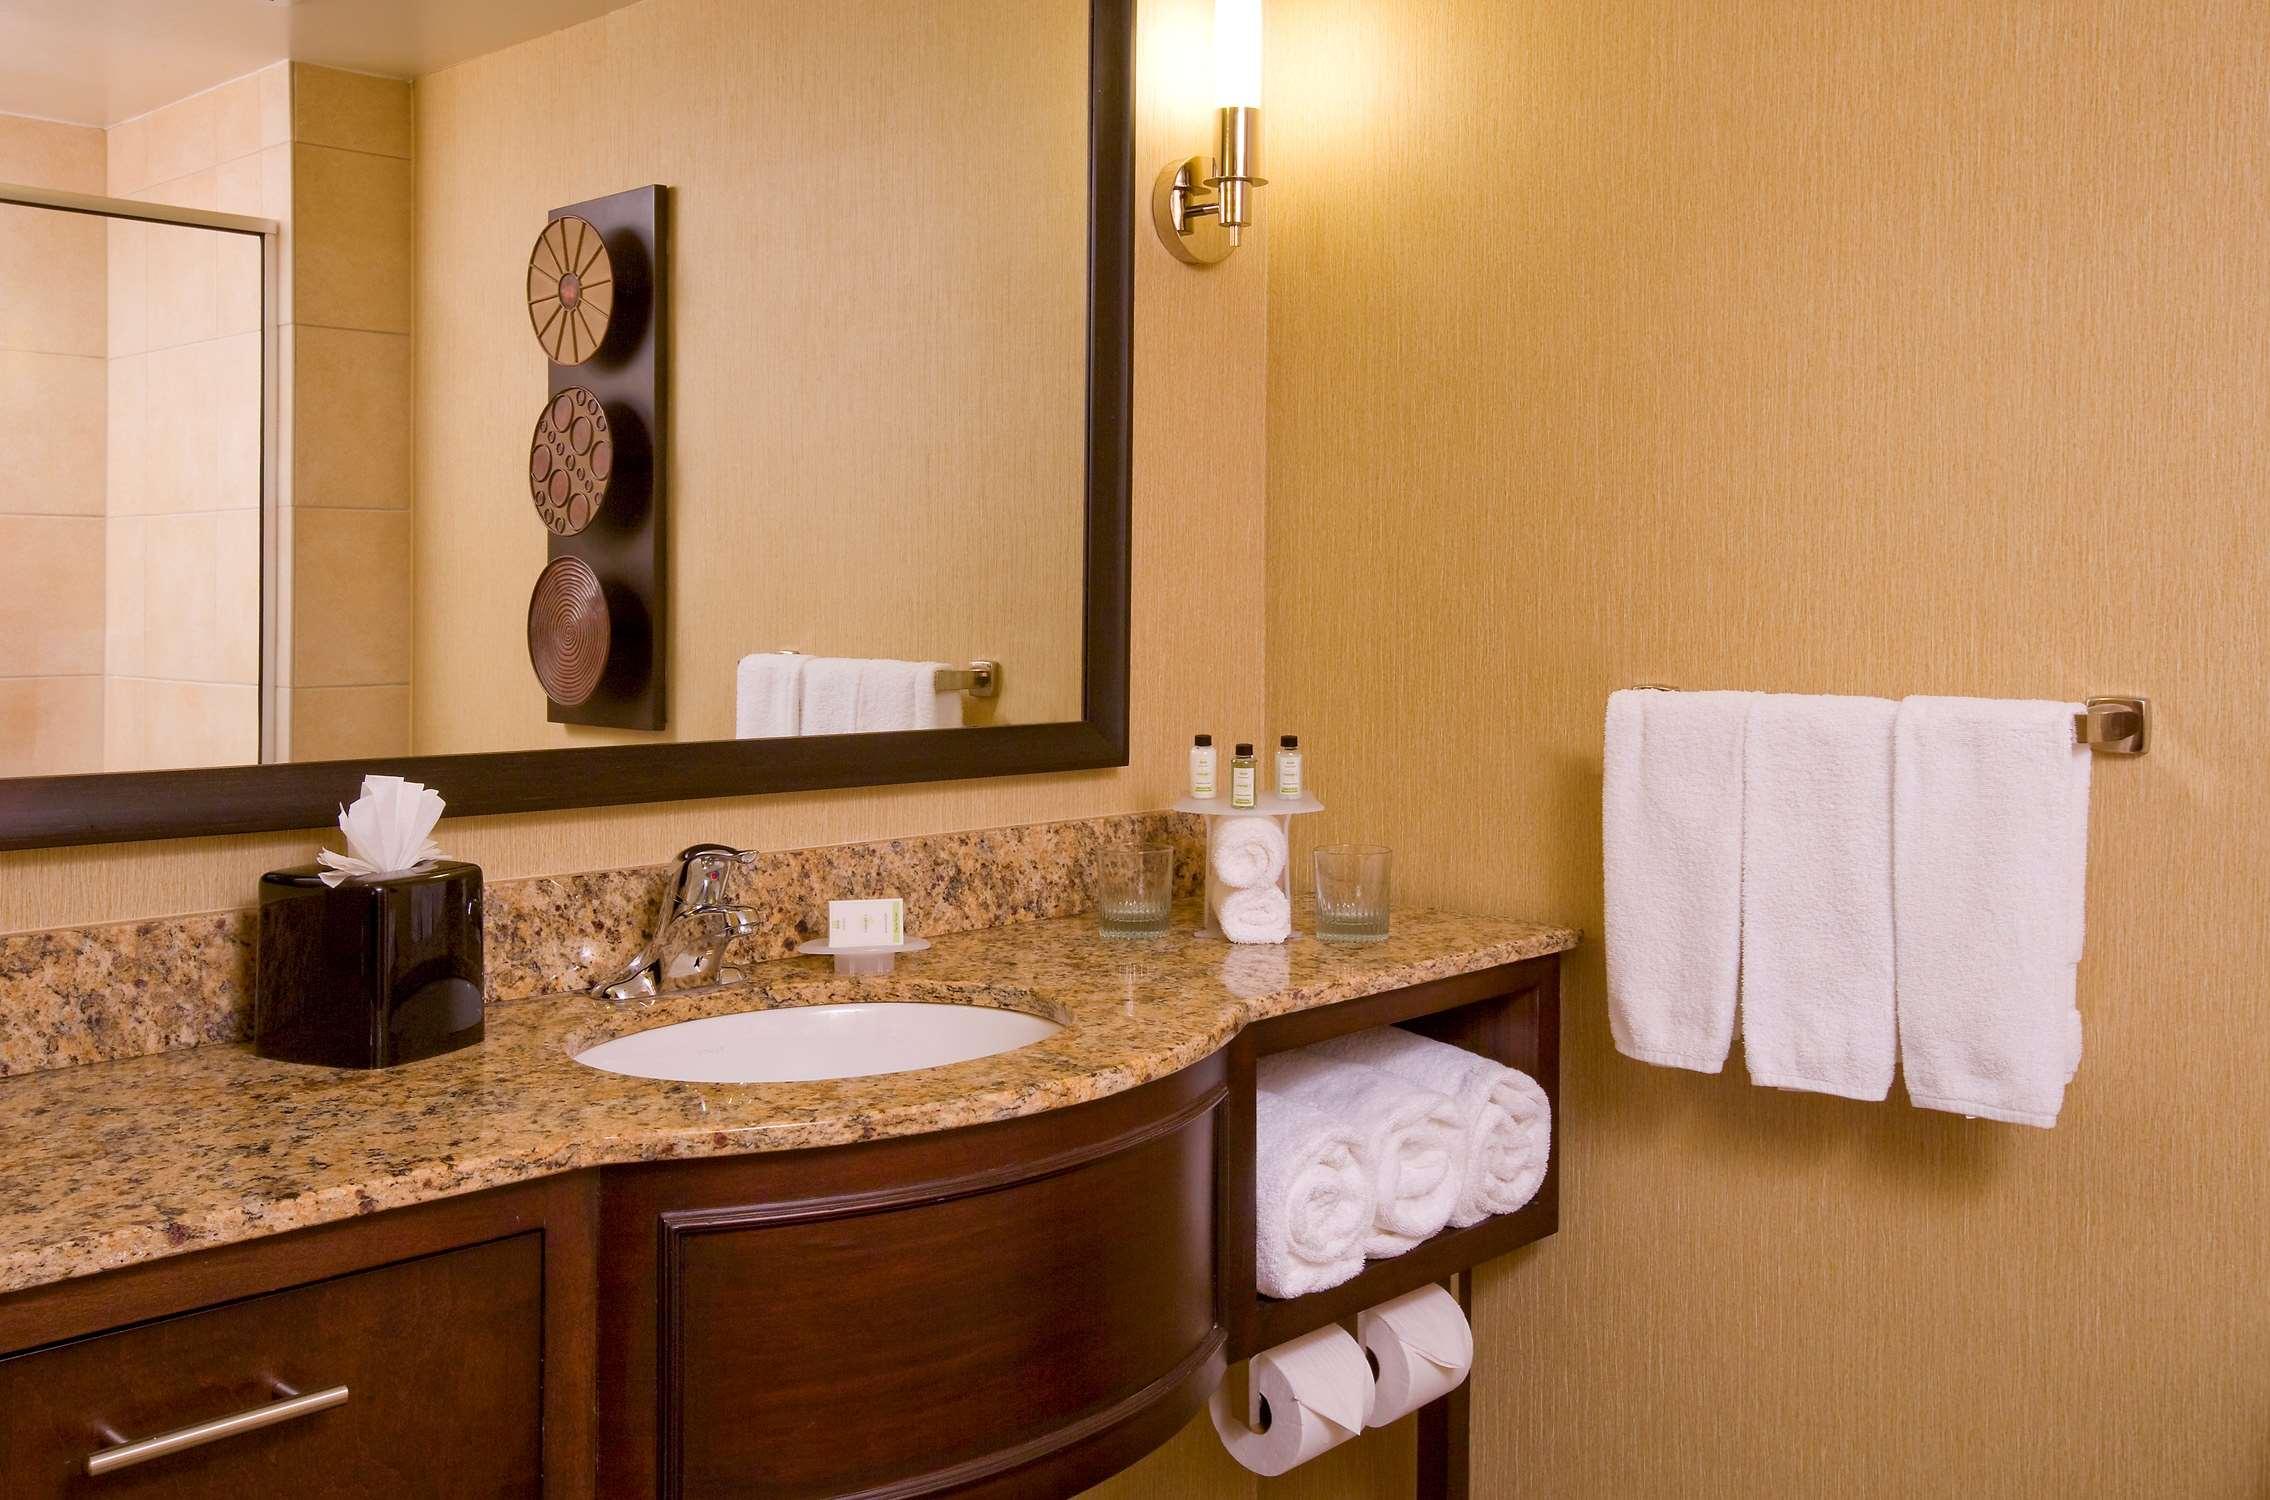 Embassy Suites by Hilton Houston Energy Corridor image 26